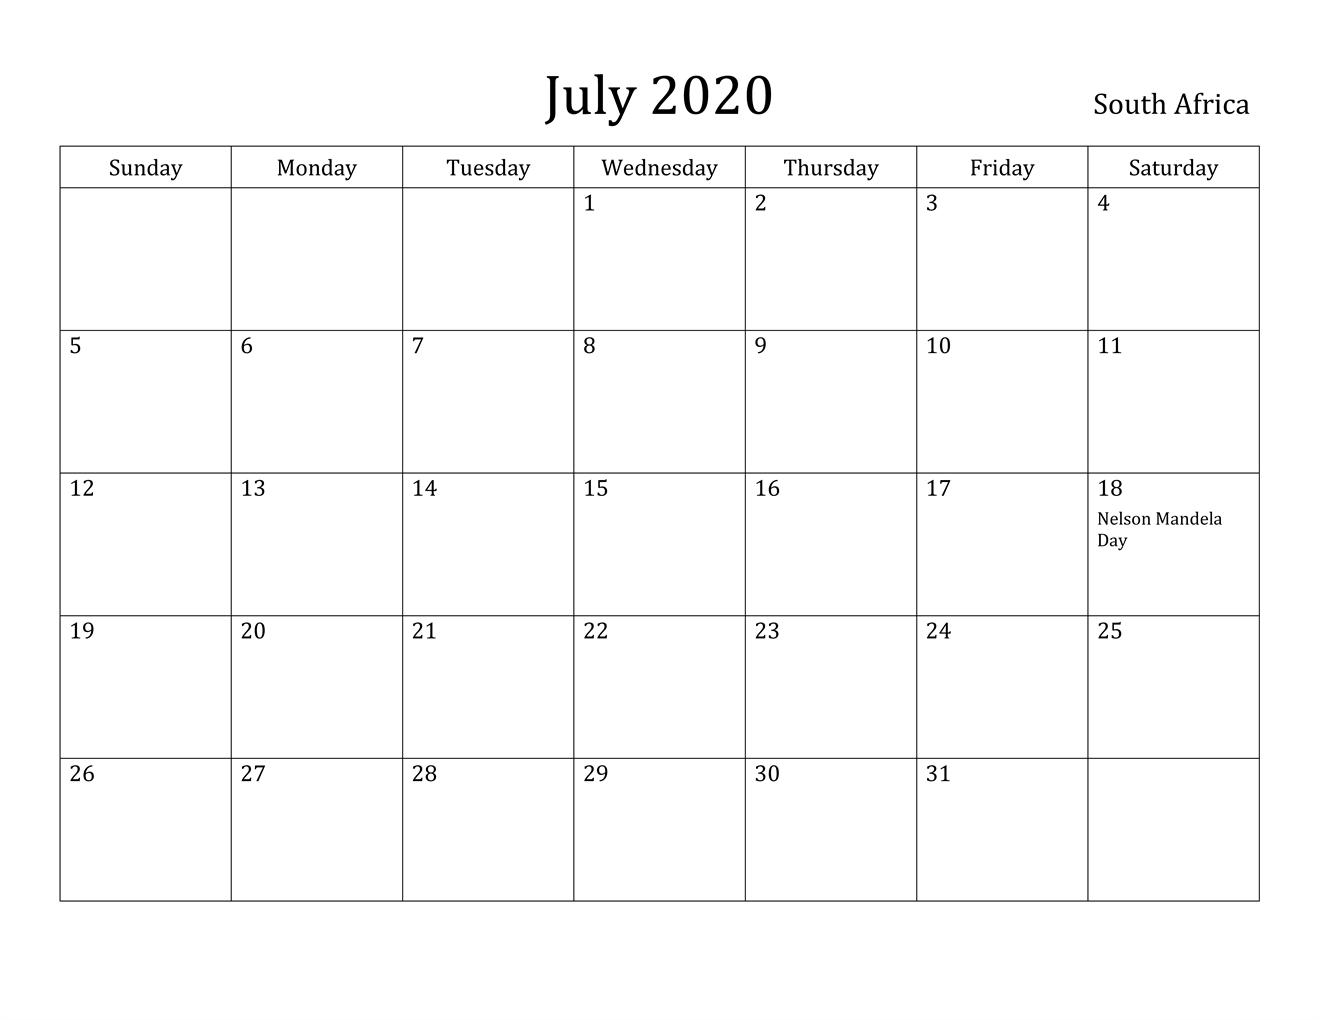 July 2020 Calendar South Africa